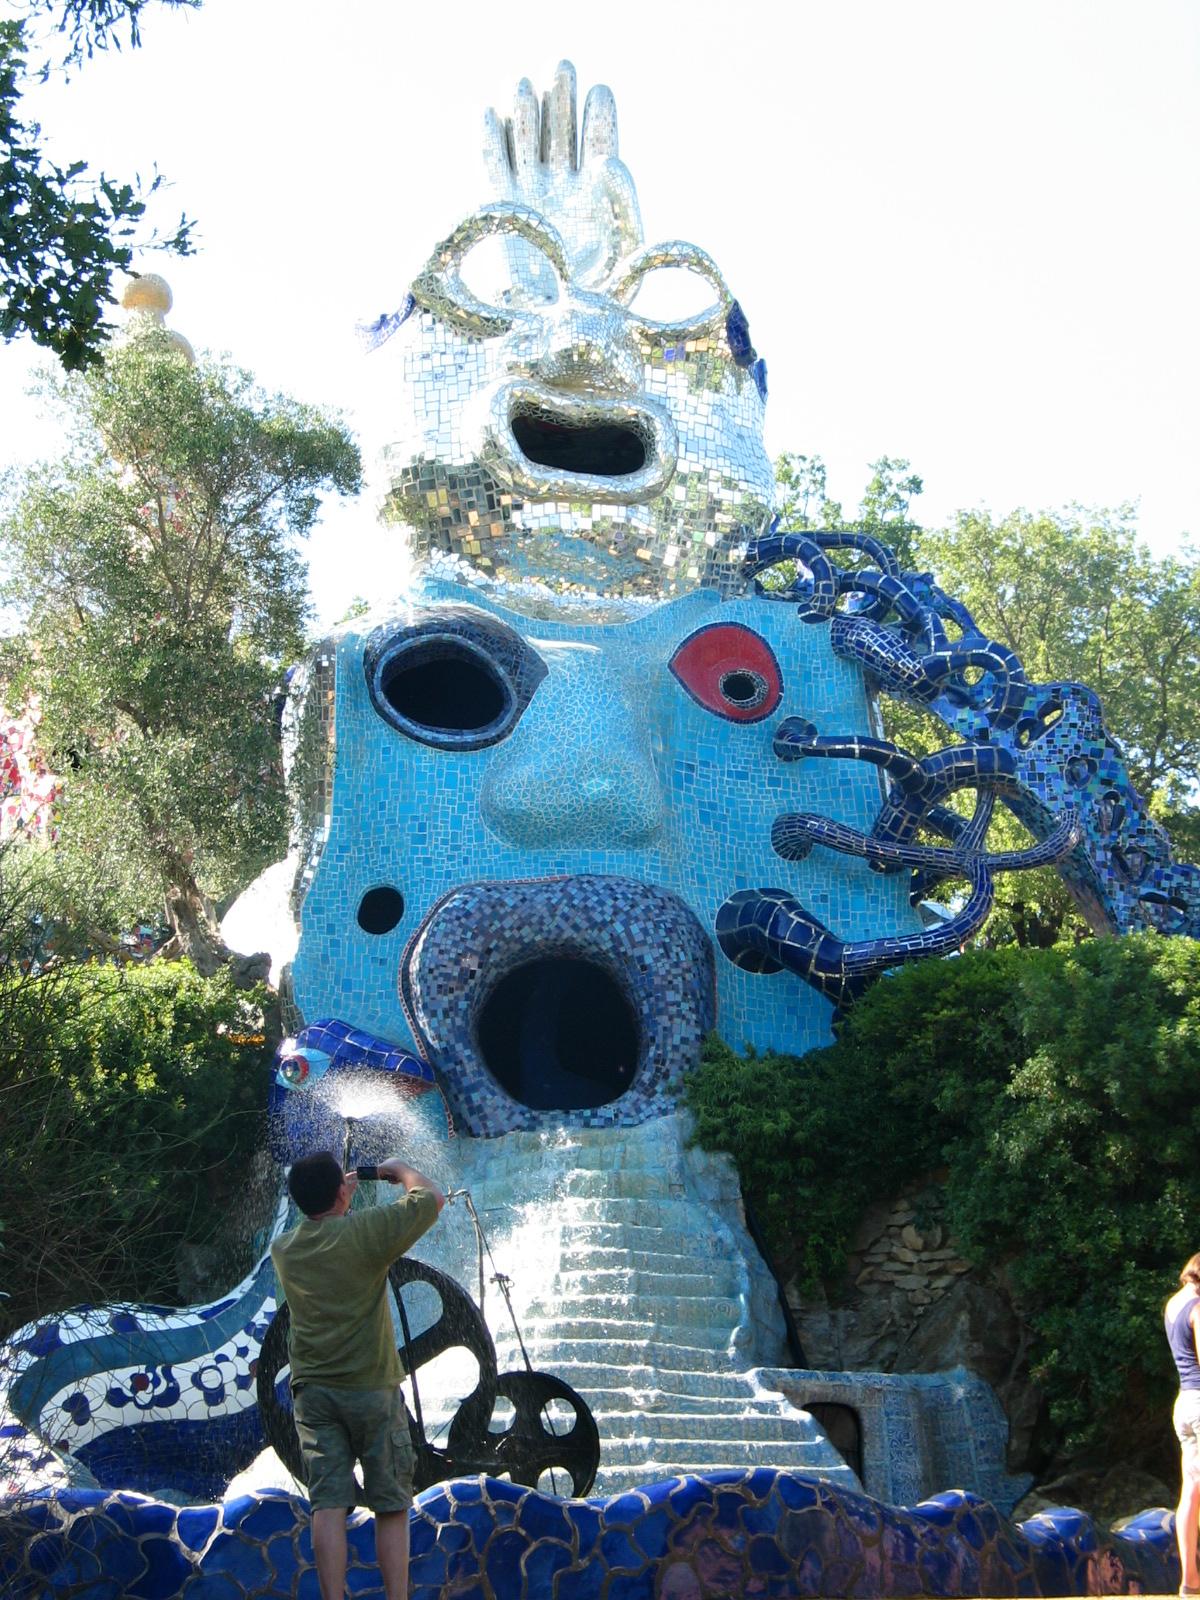 Des représentations du Tarot grandioses et colorées